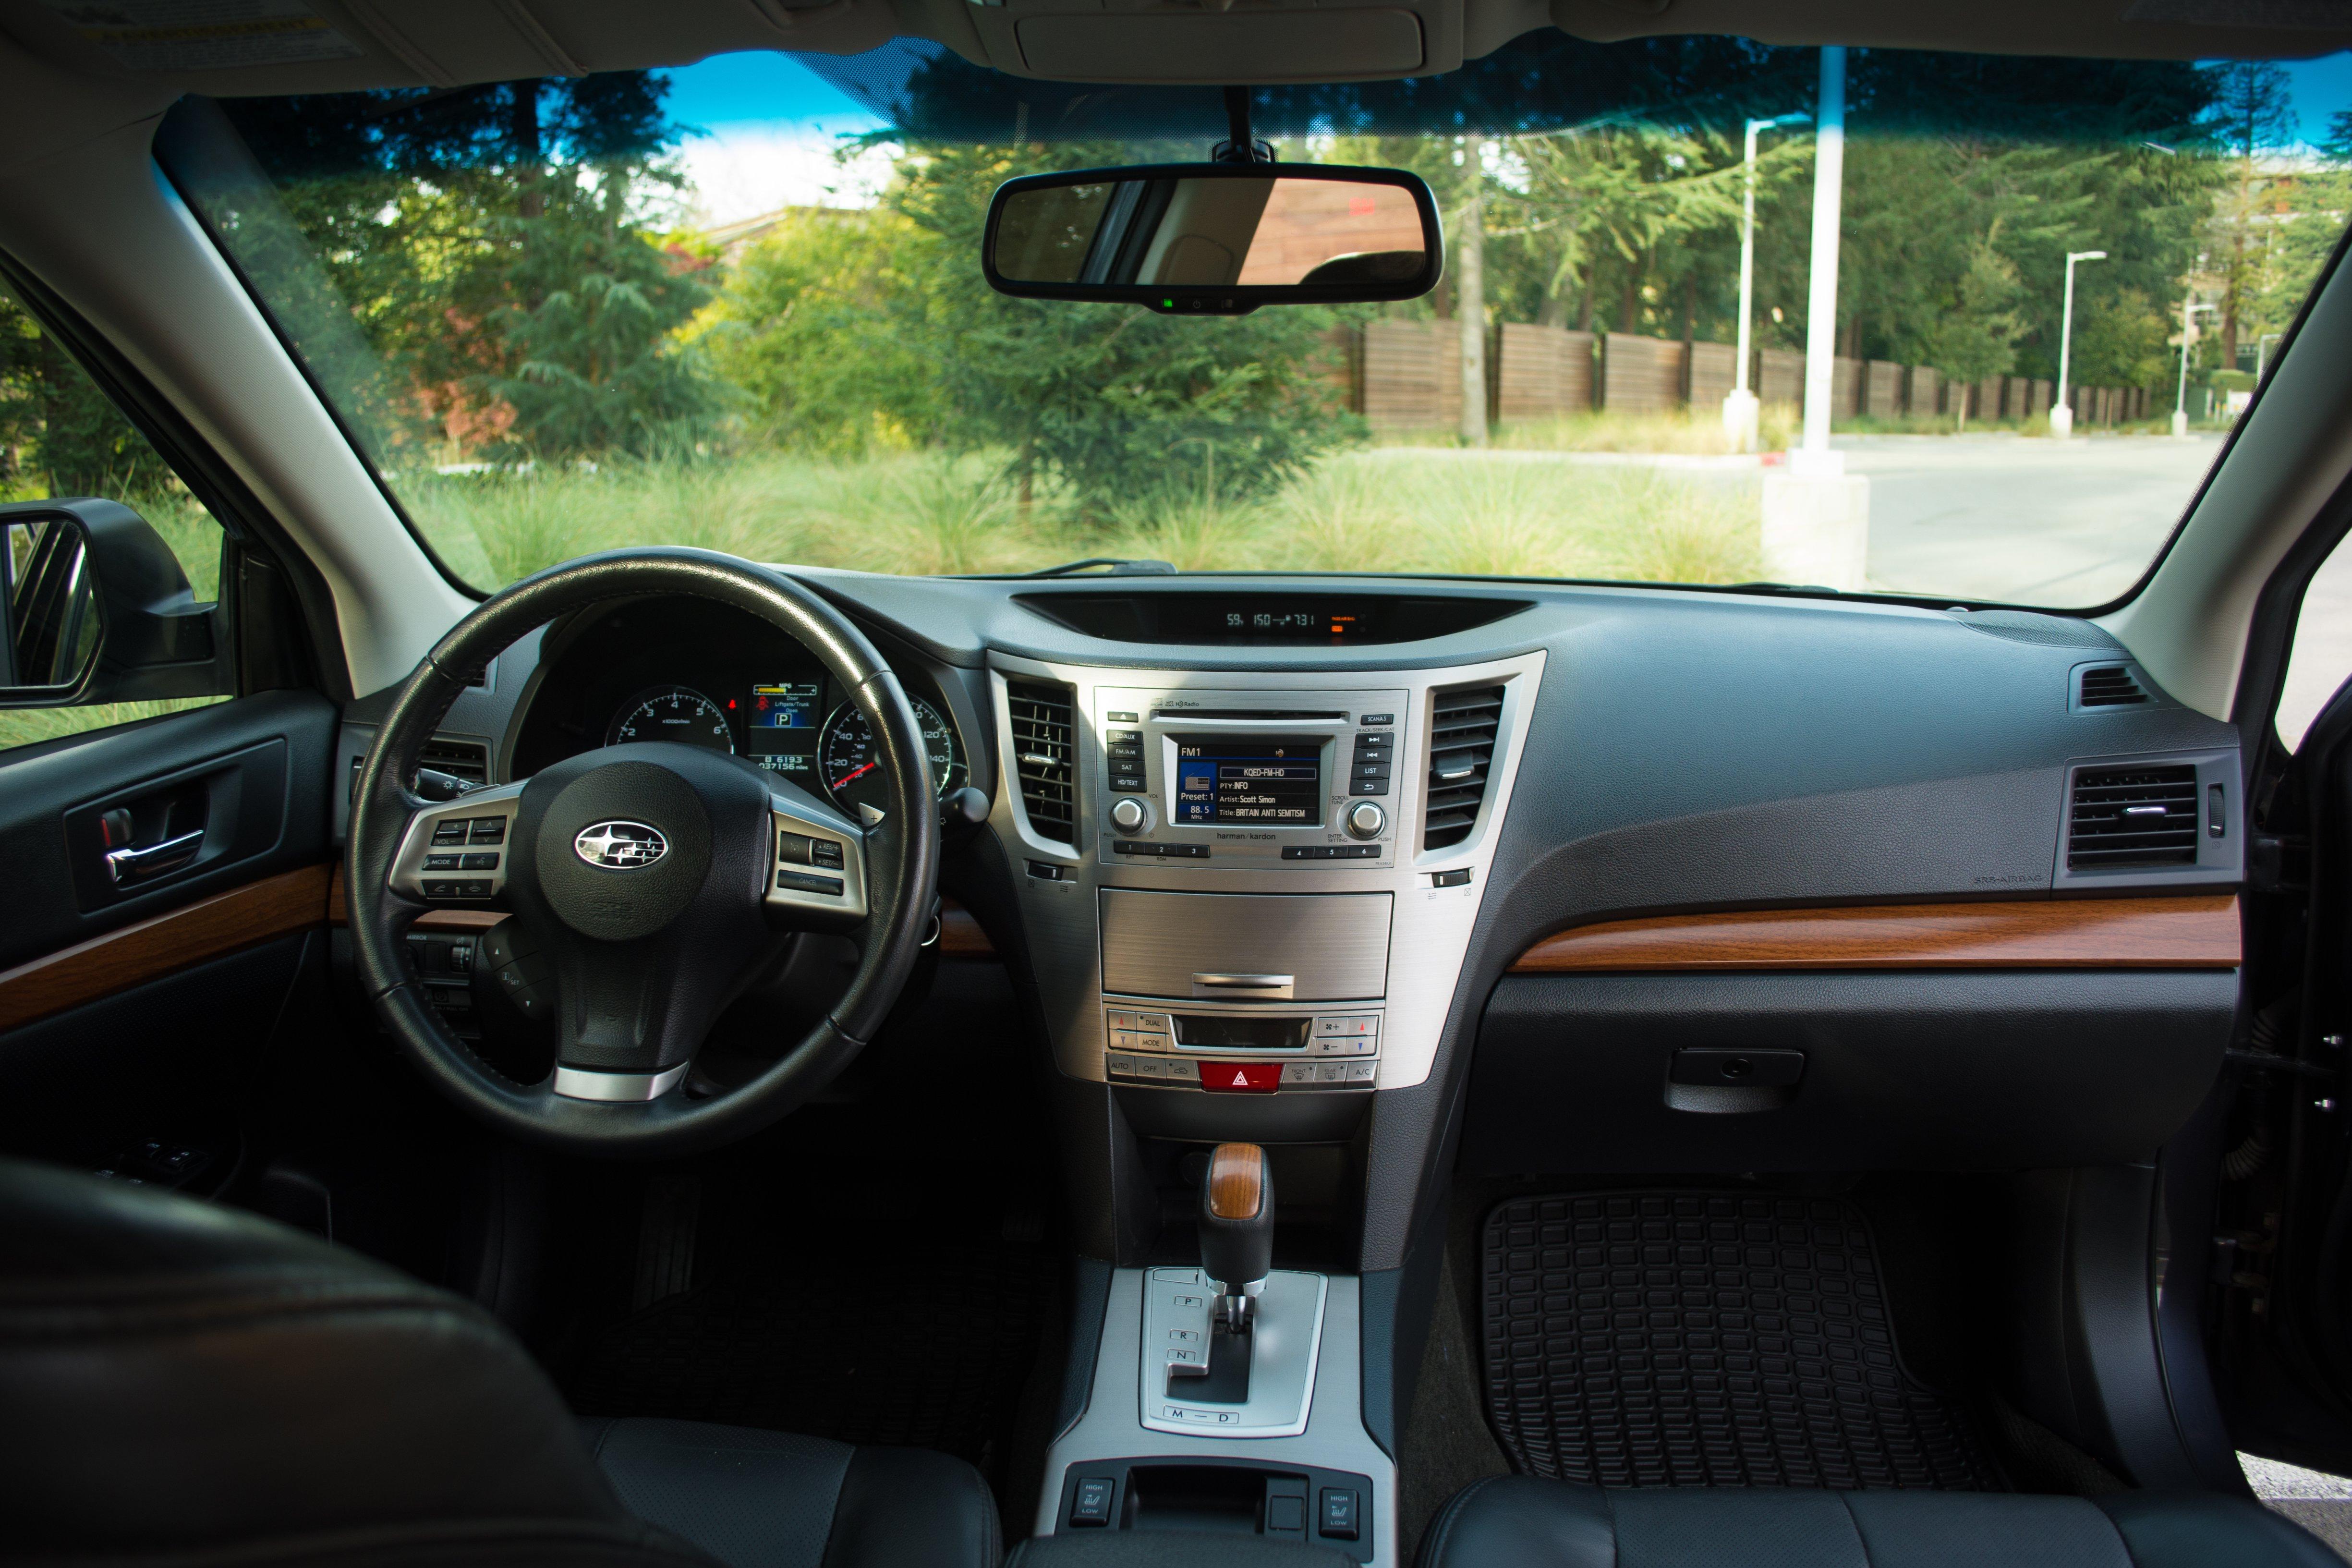 FS 2013 Subaru Outback 3 6R Limited 37 200 miles